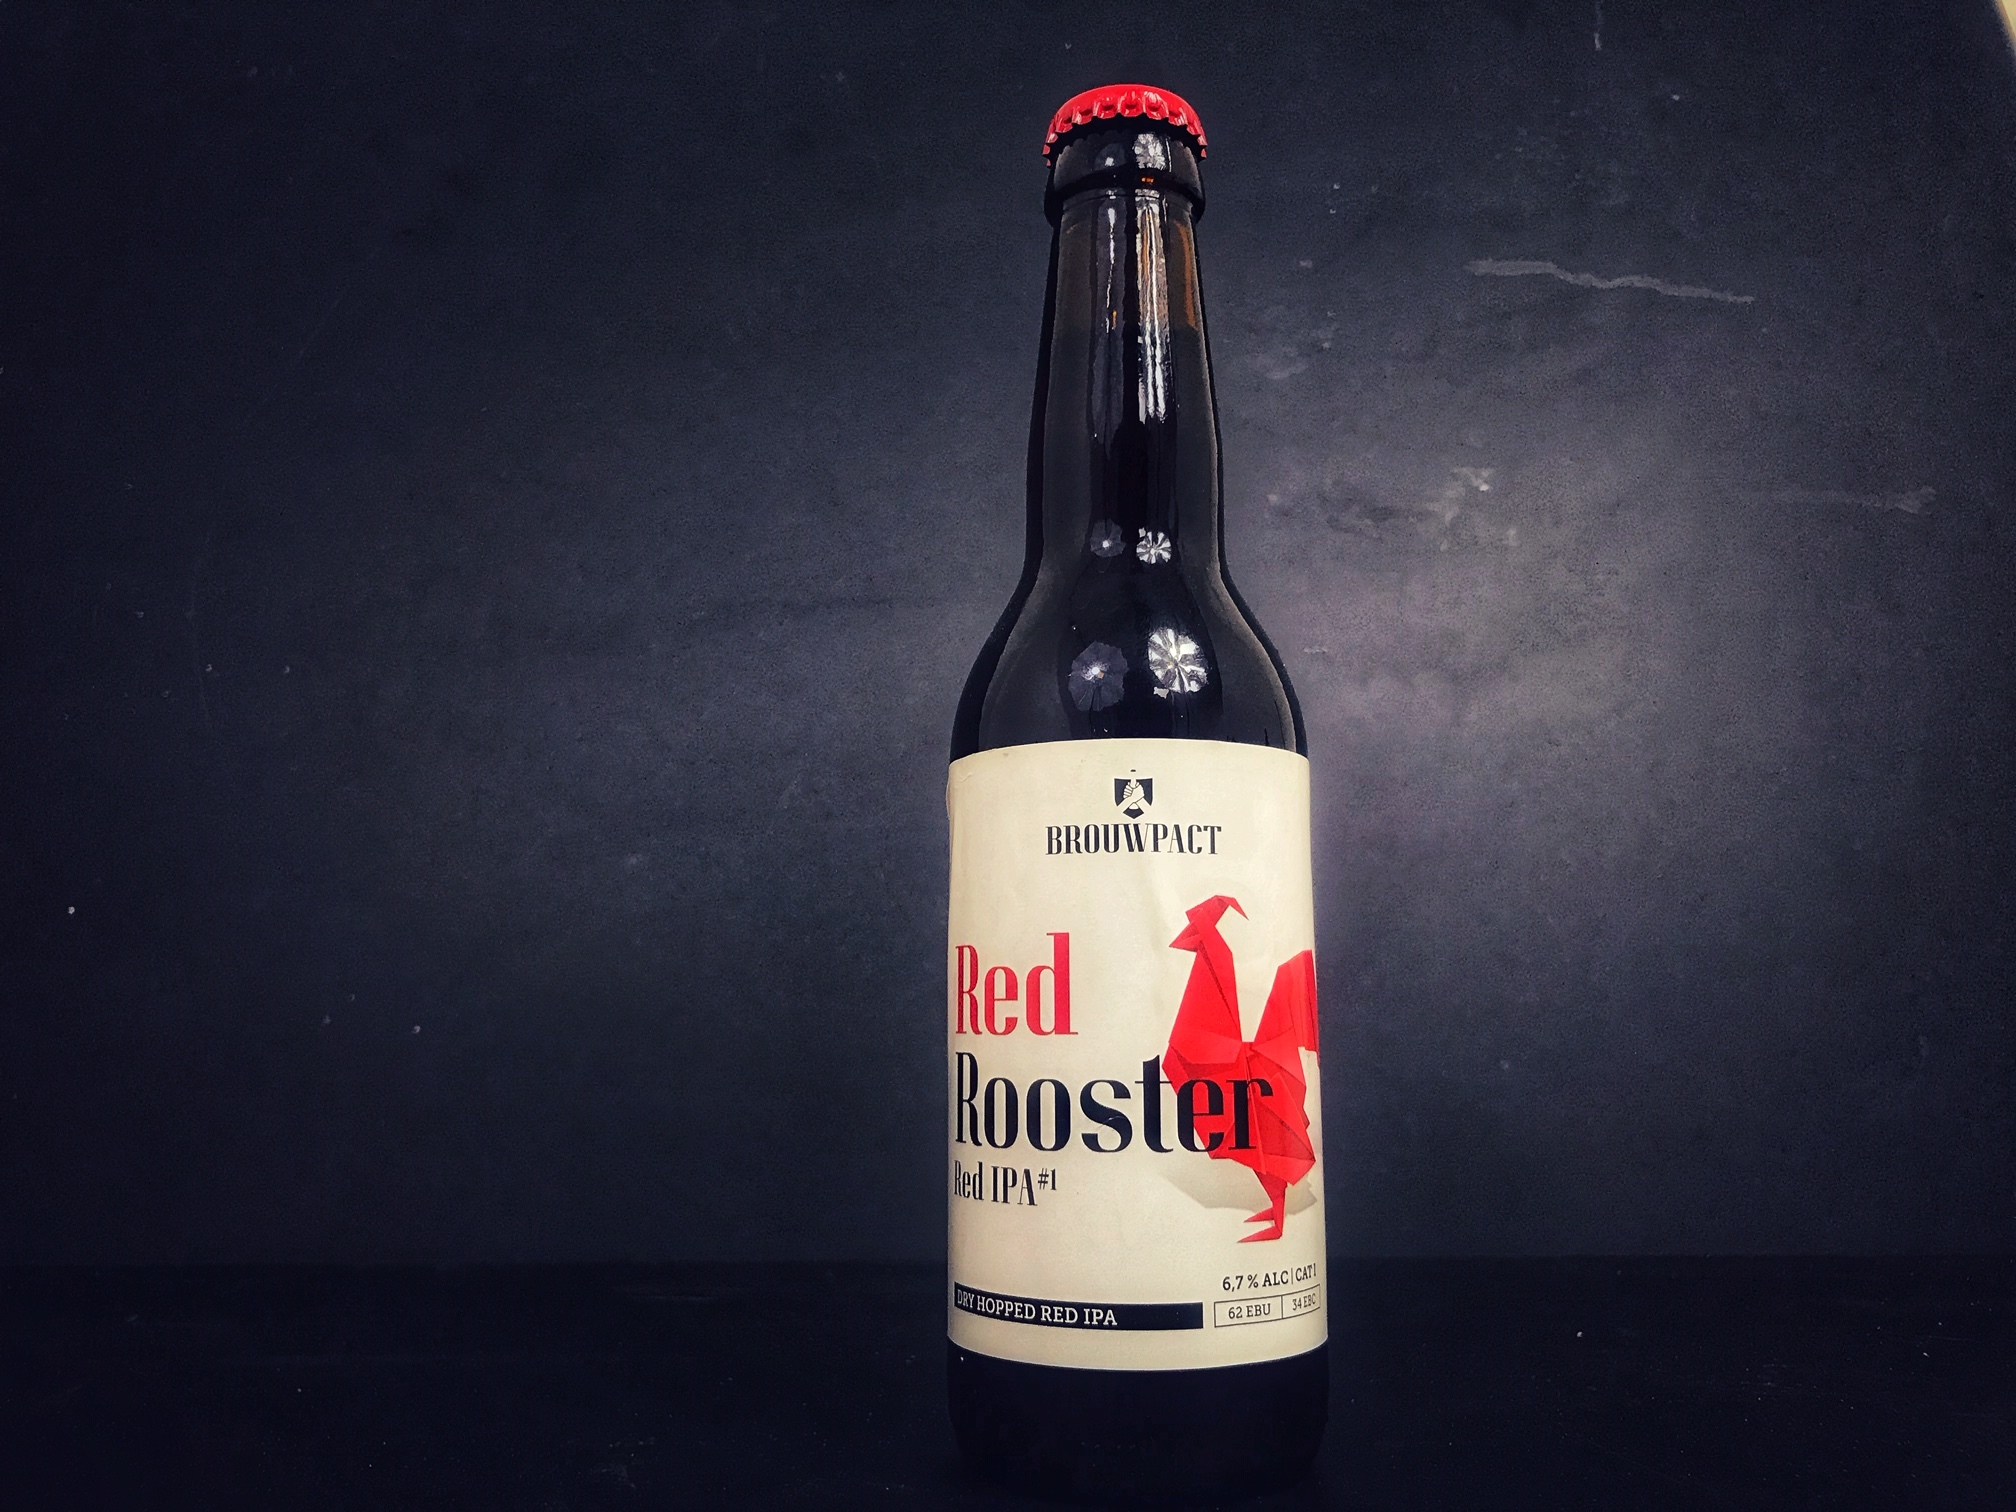 Red Rooster #1 van Brouwpact